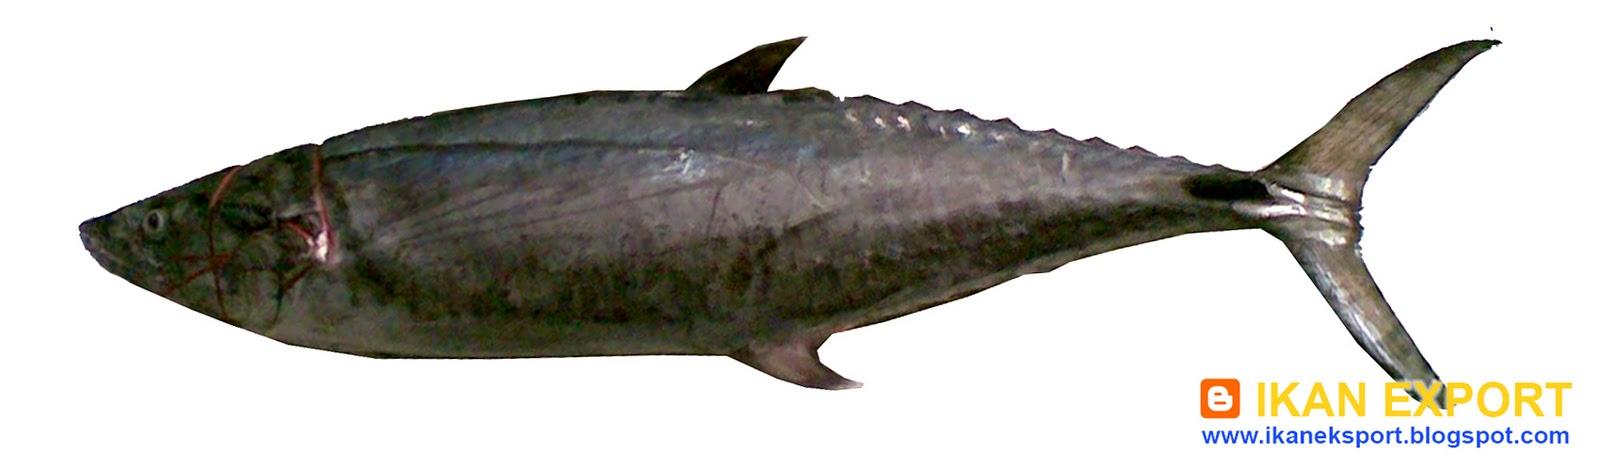 TENGGIRI+ +TINUMBU+ +SARDEN+MACKEREL+FISH